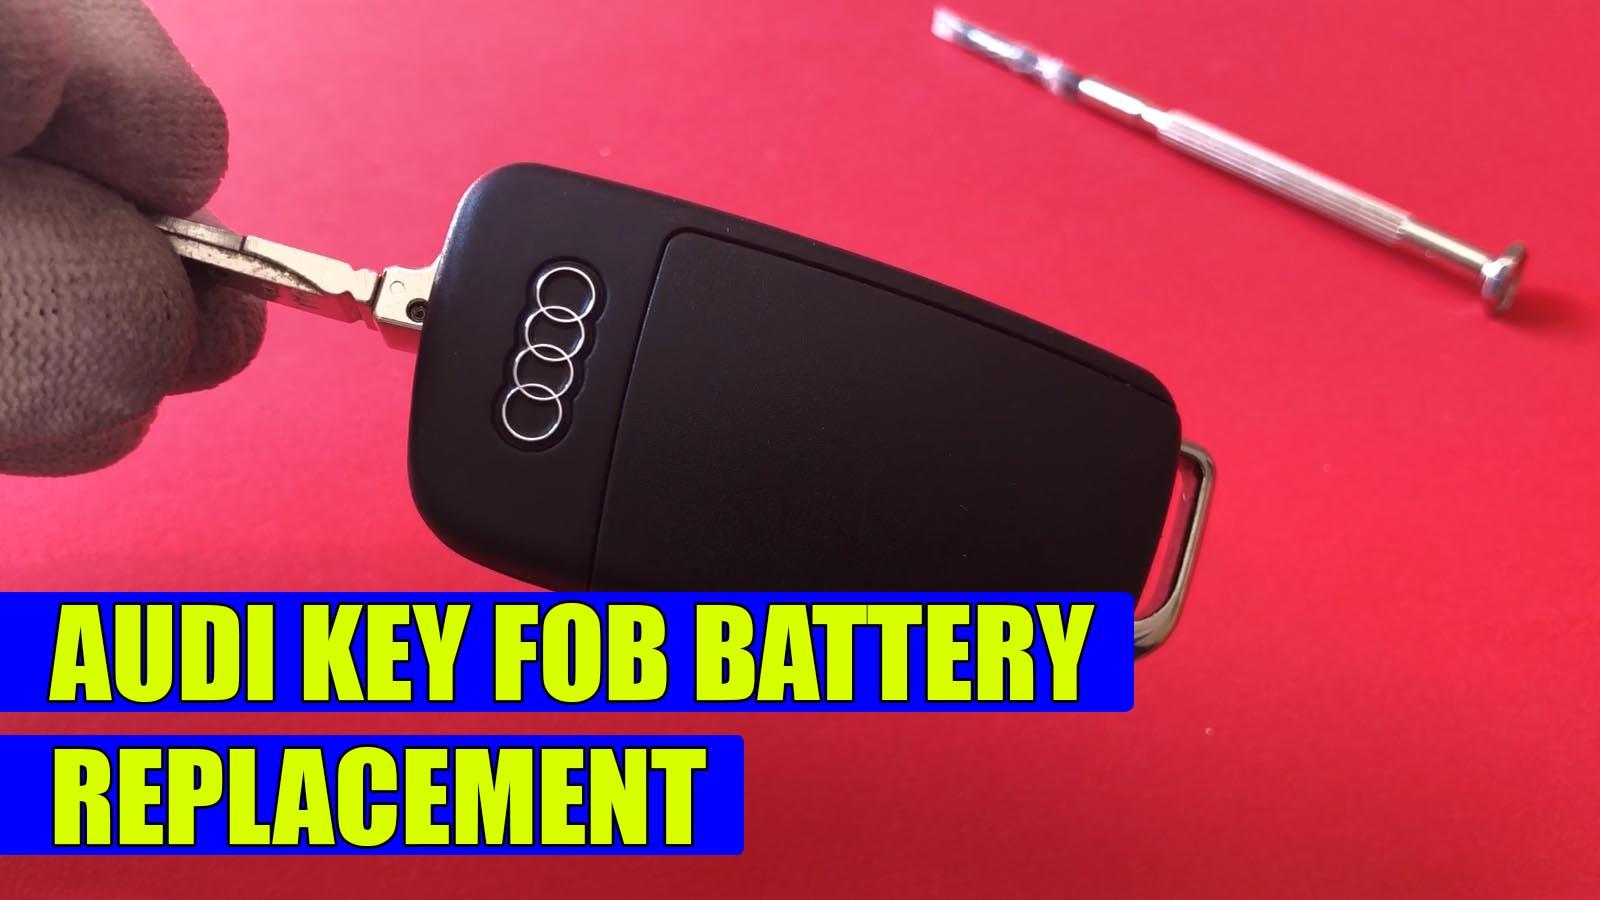 Tutoriale Din Service Invata Sa Ti Repari Intretii Singur Masina Mazda 5 Engine Diagram How To Replace The Battery On Audi Key Fob A3 A4 A5 A6 A7 A8 Q5 Q3 Q7